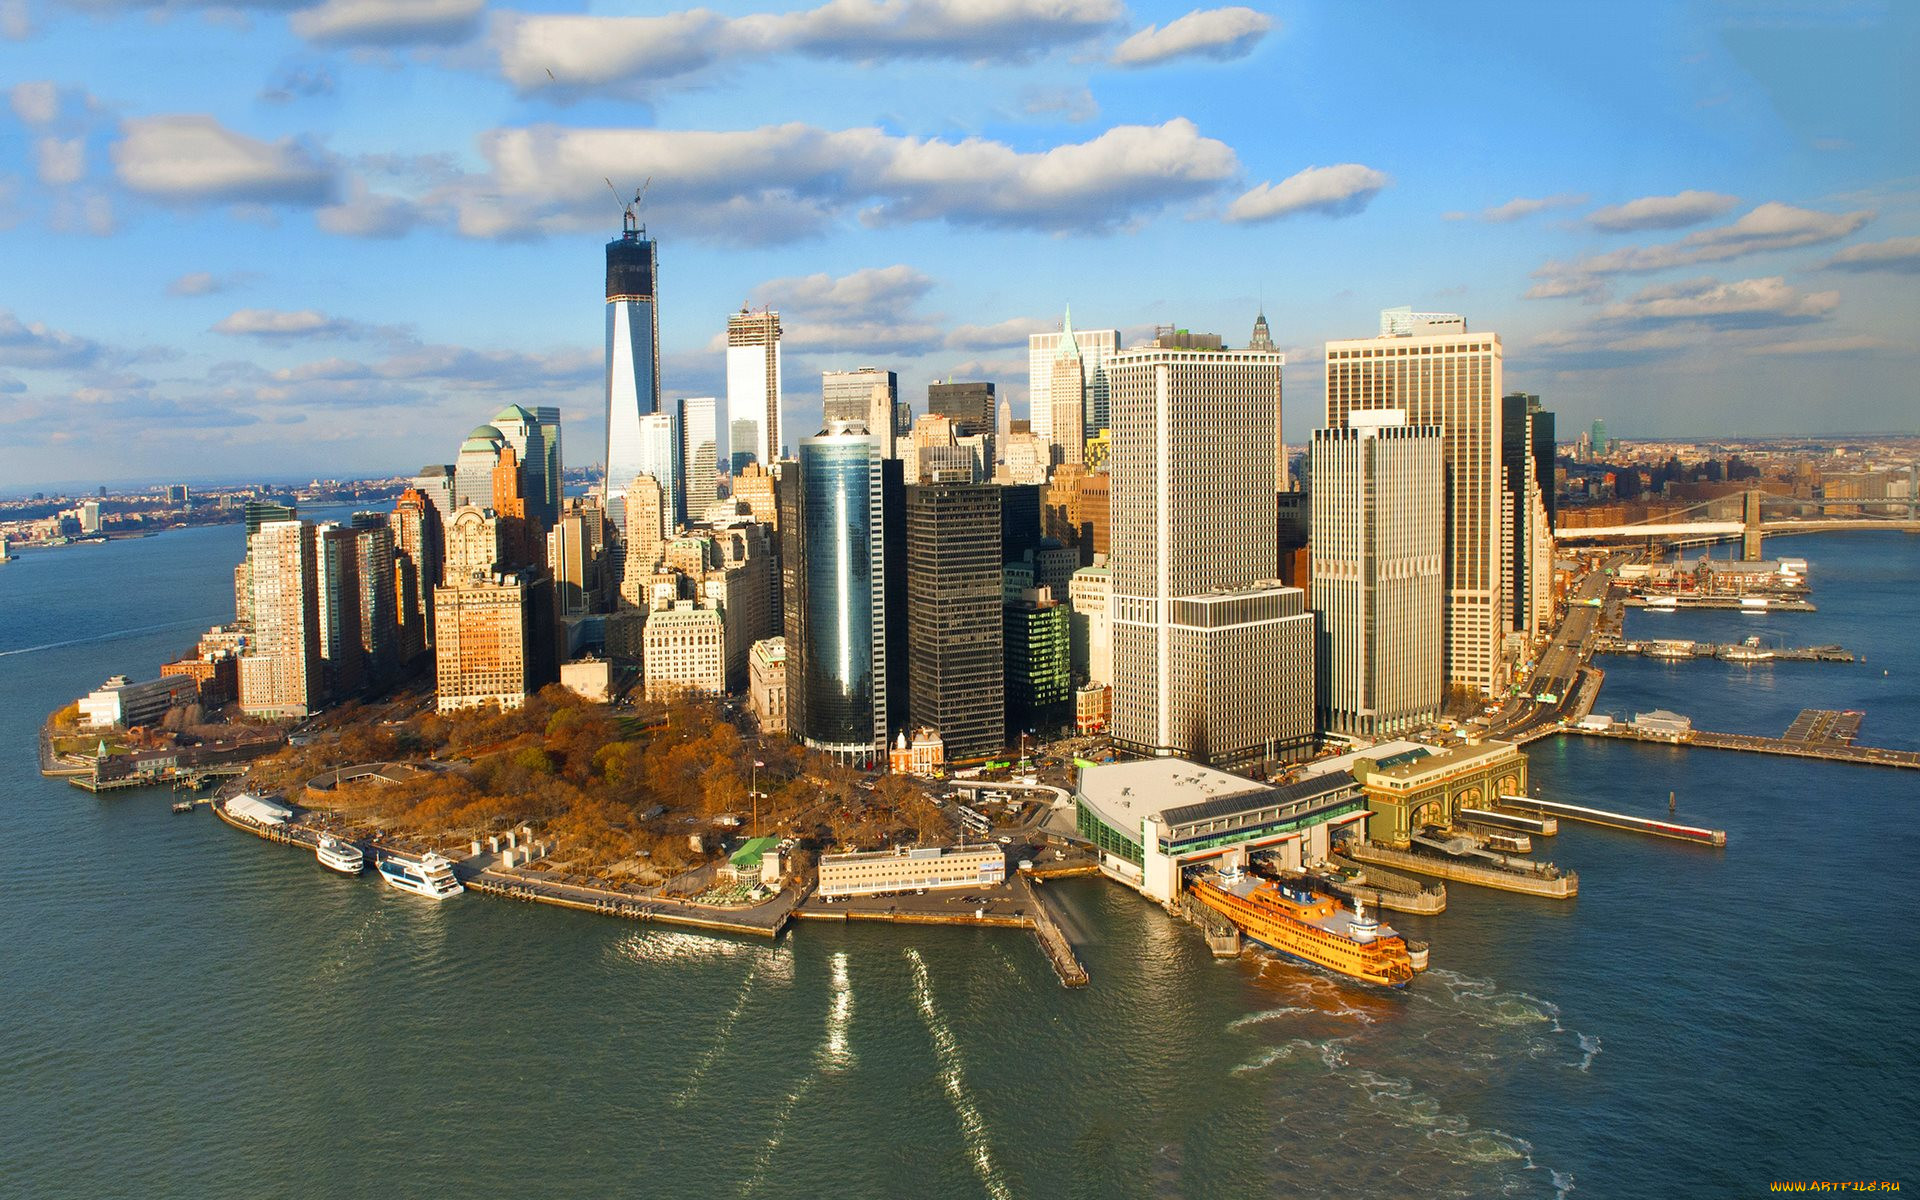 вам фото города манхэттен фотографии